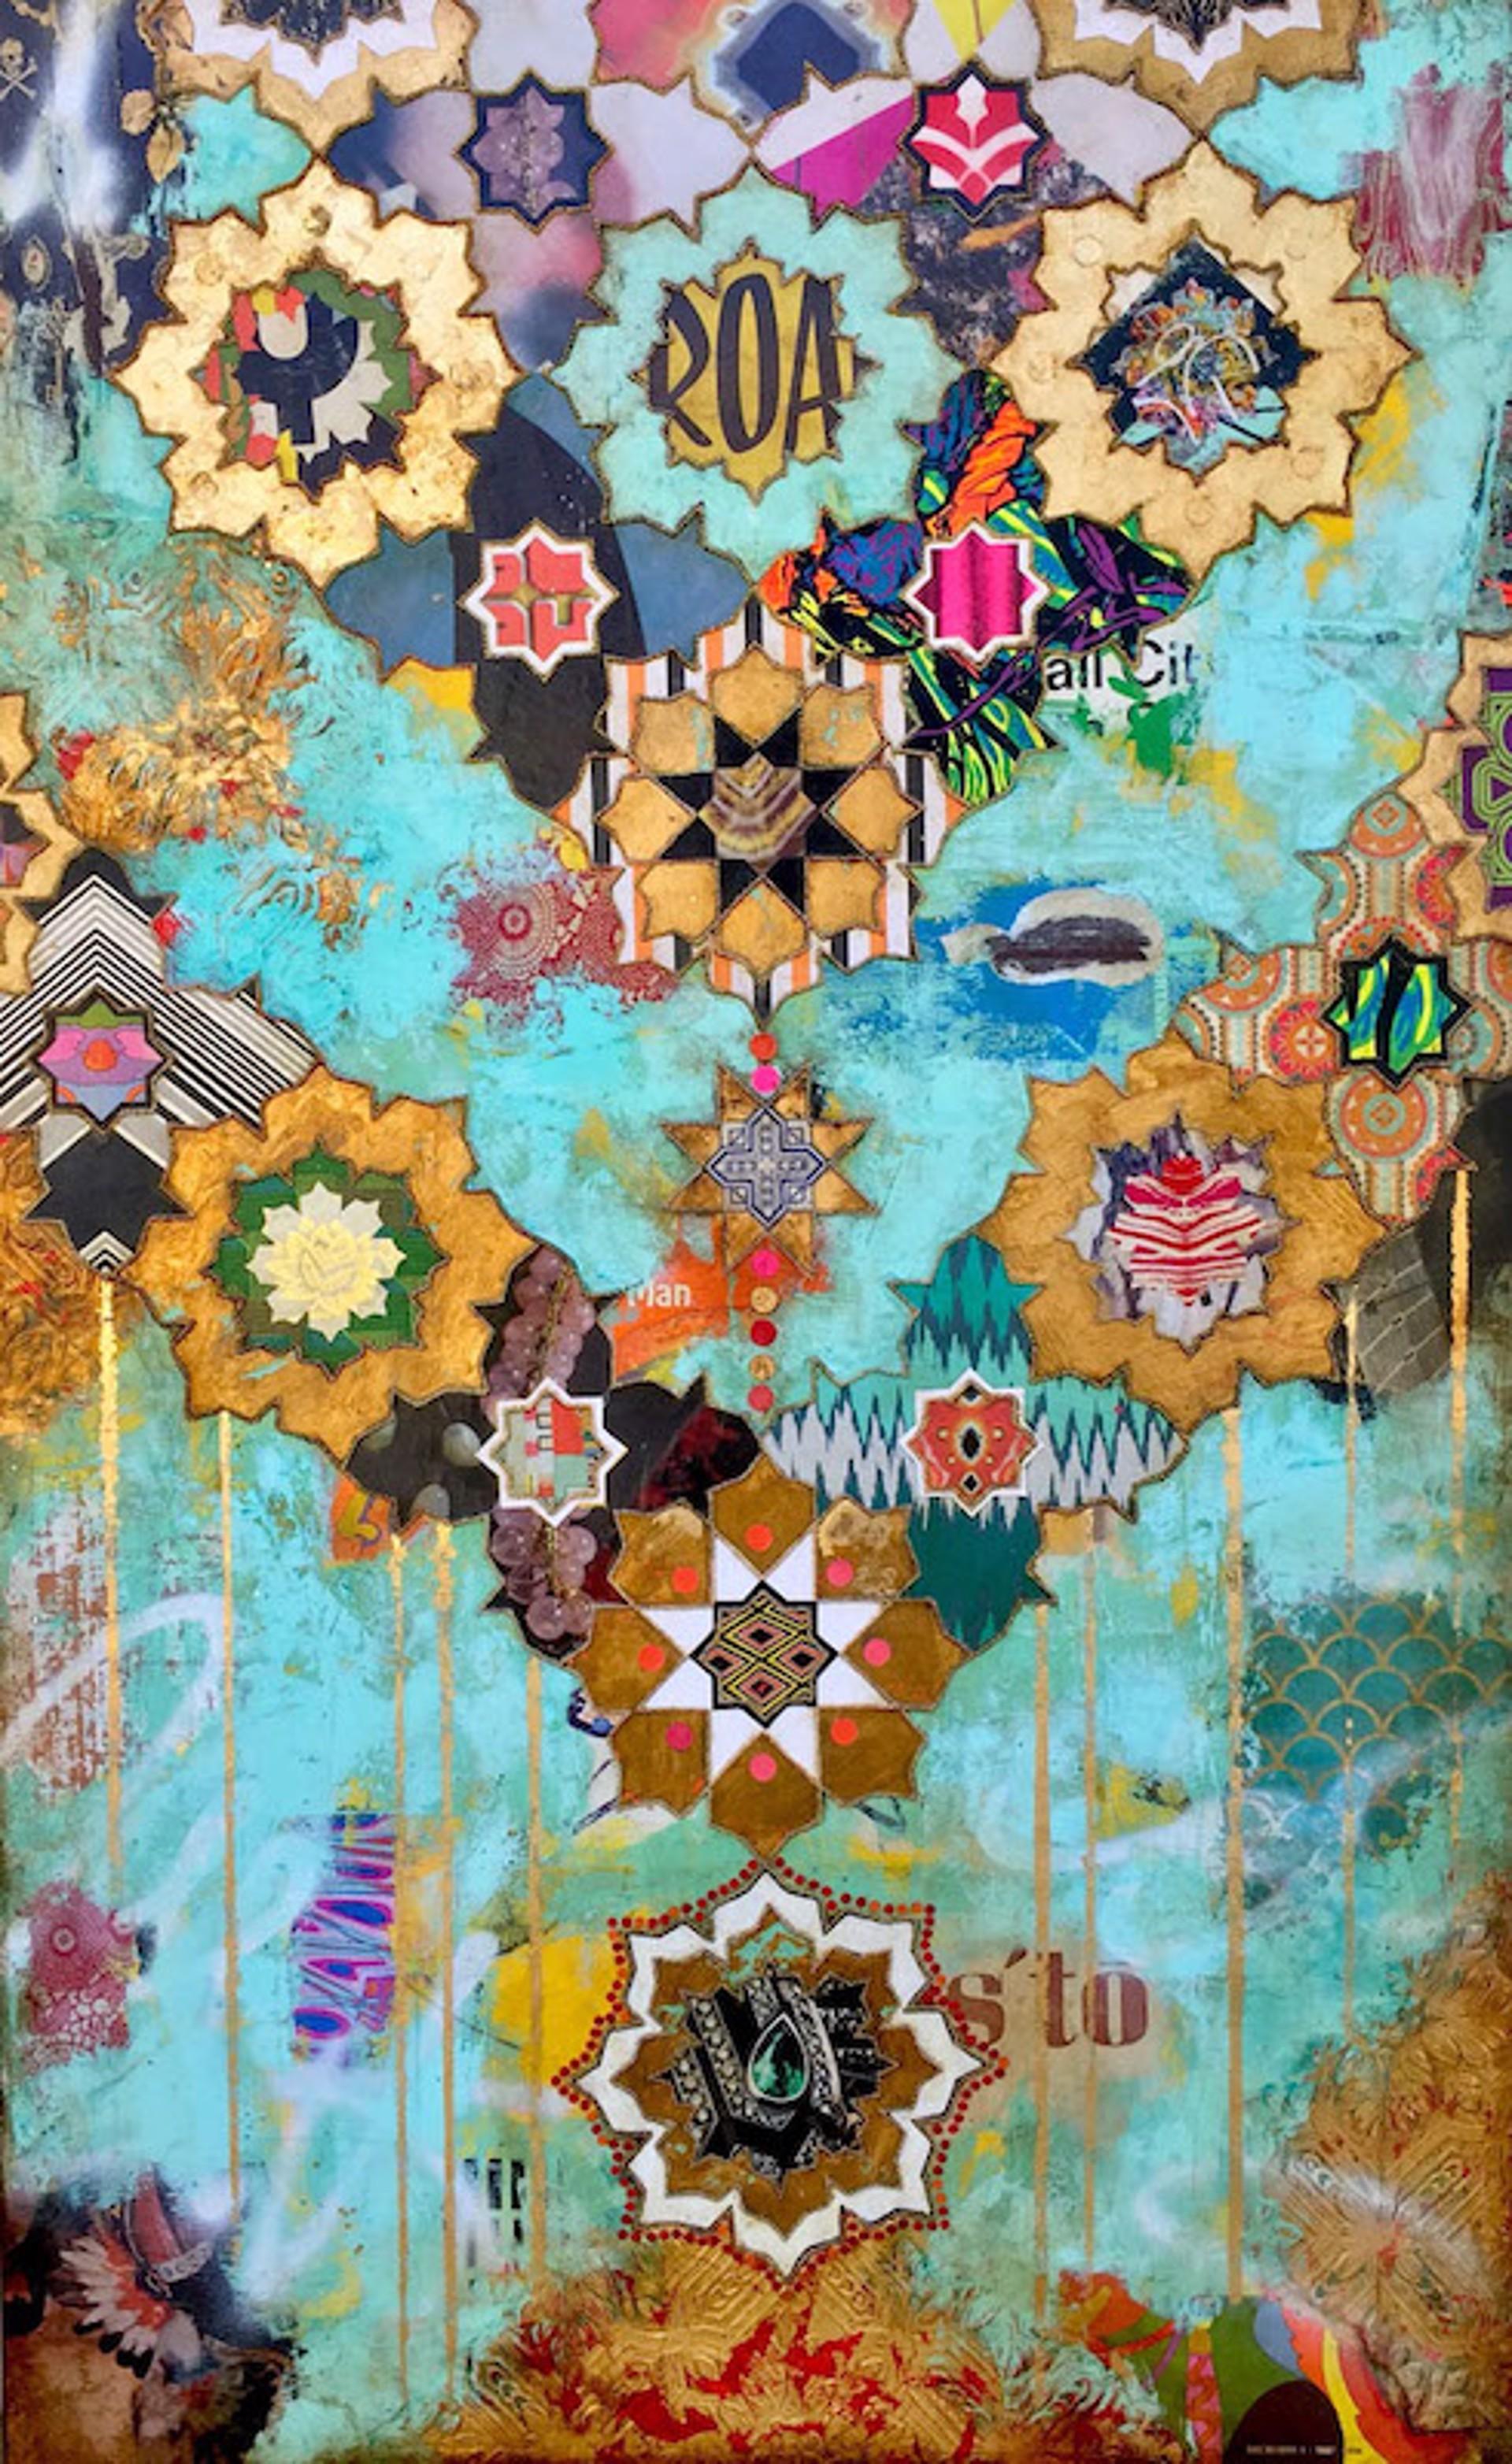 ANTHEIA by Jill Ricci